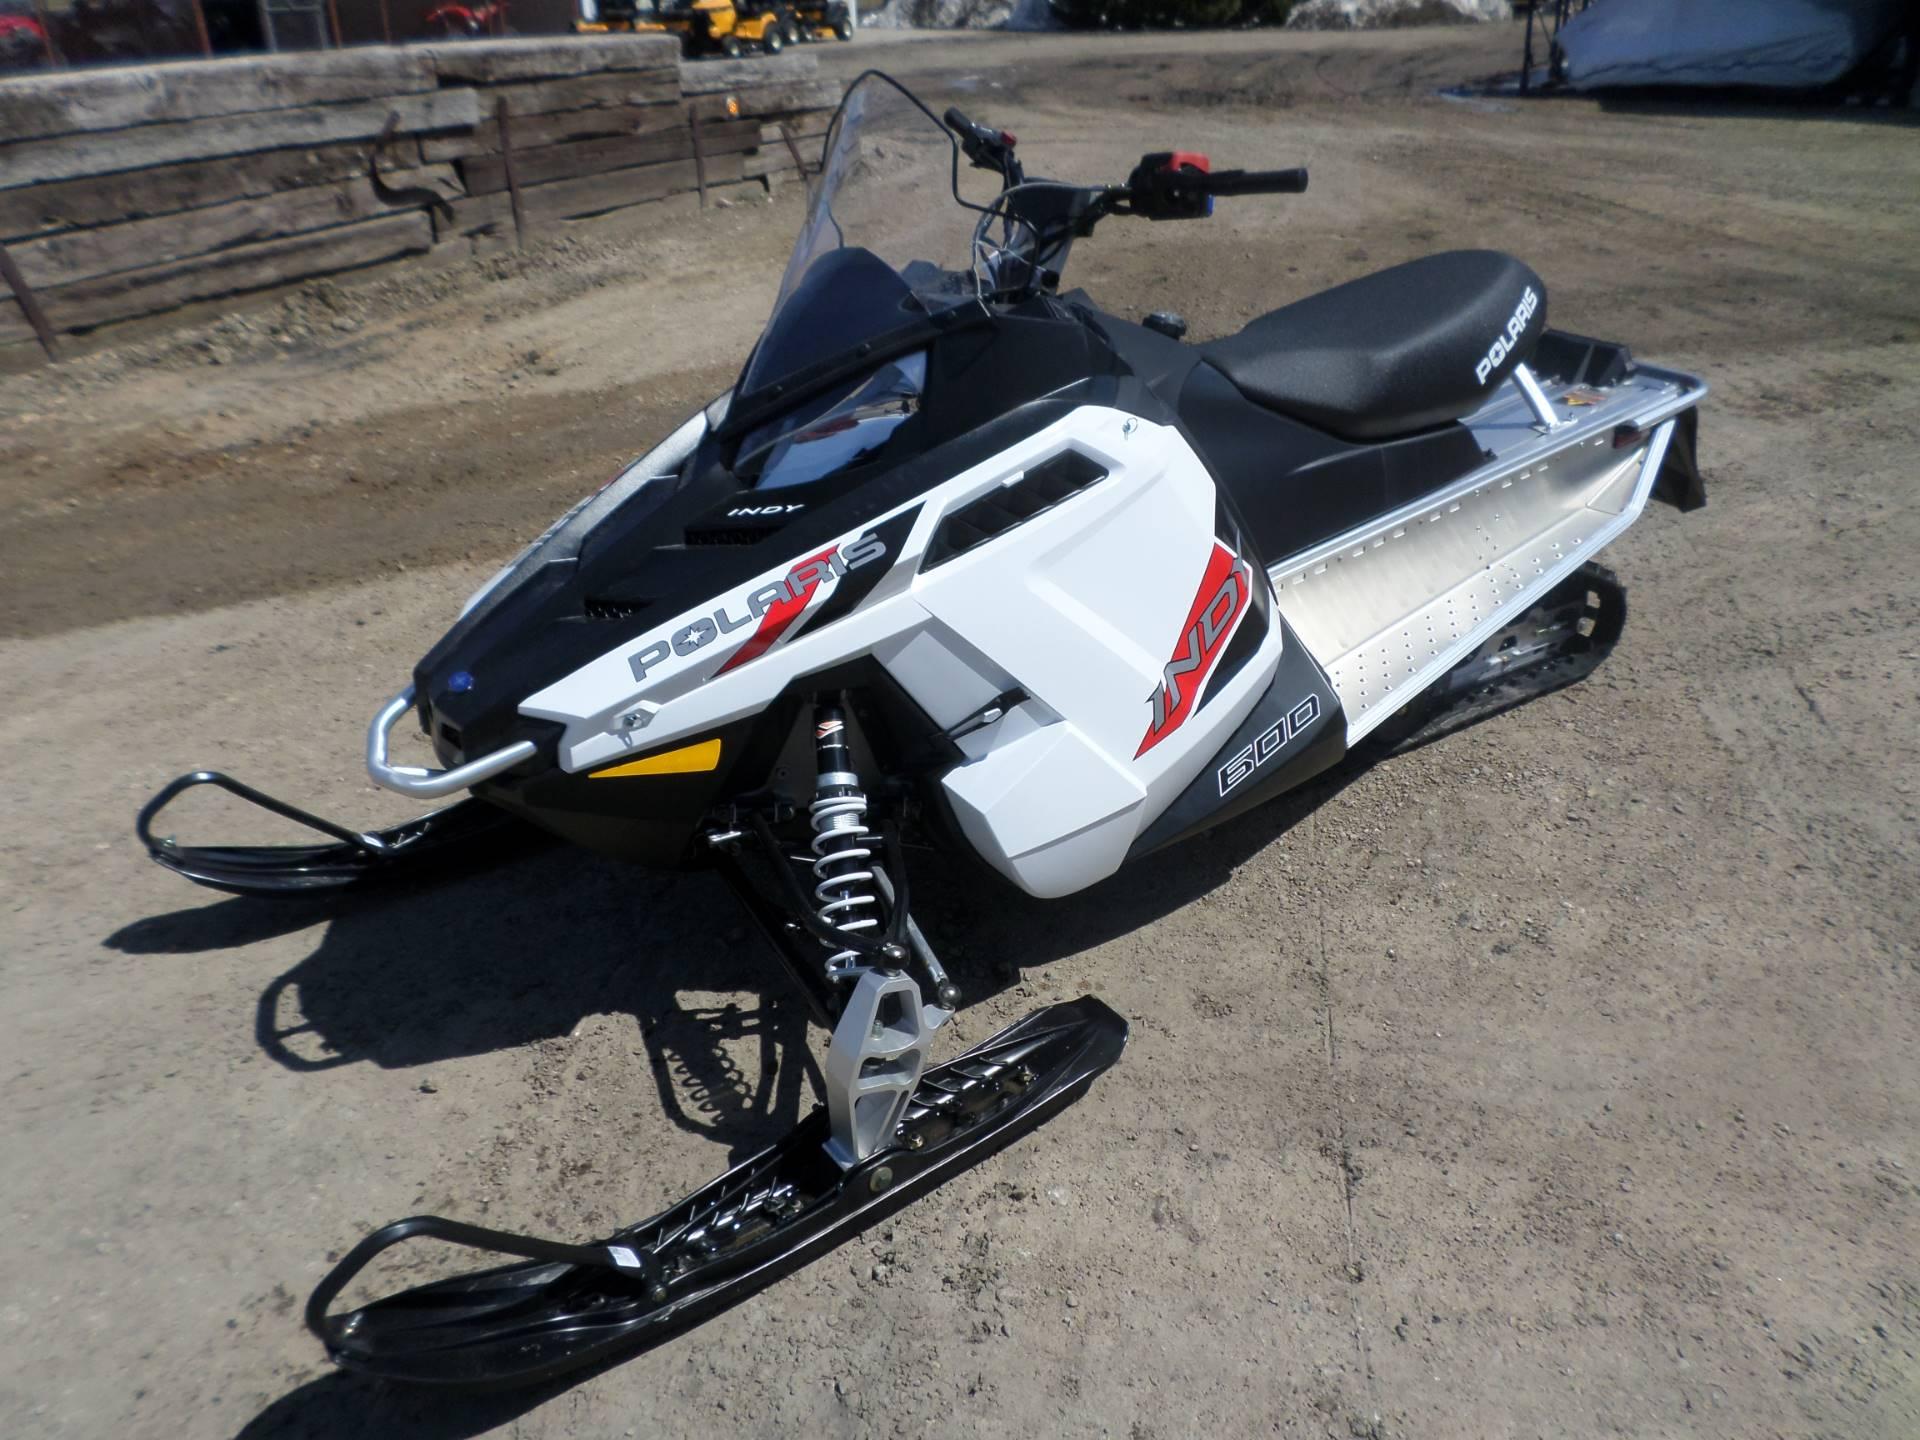 2018 Polaris 600 INDY ES for sale 2069